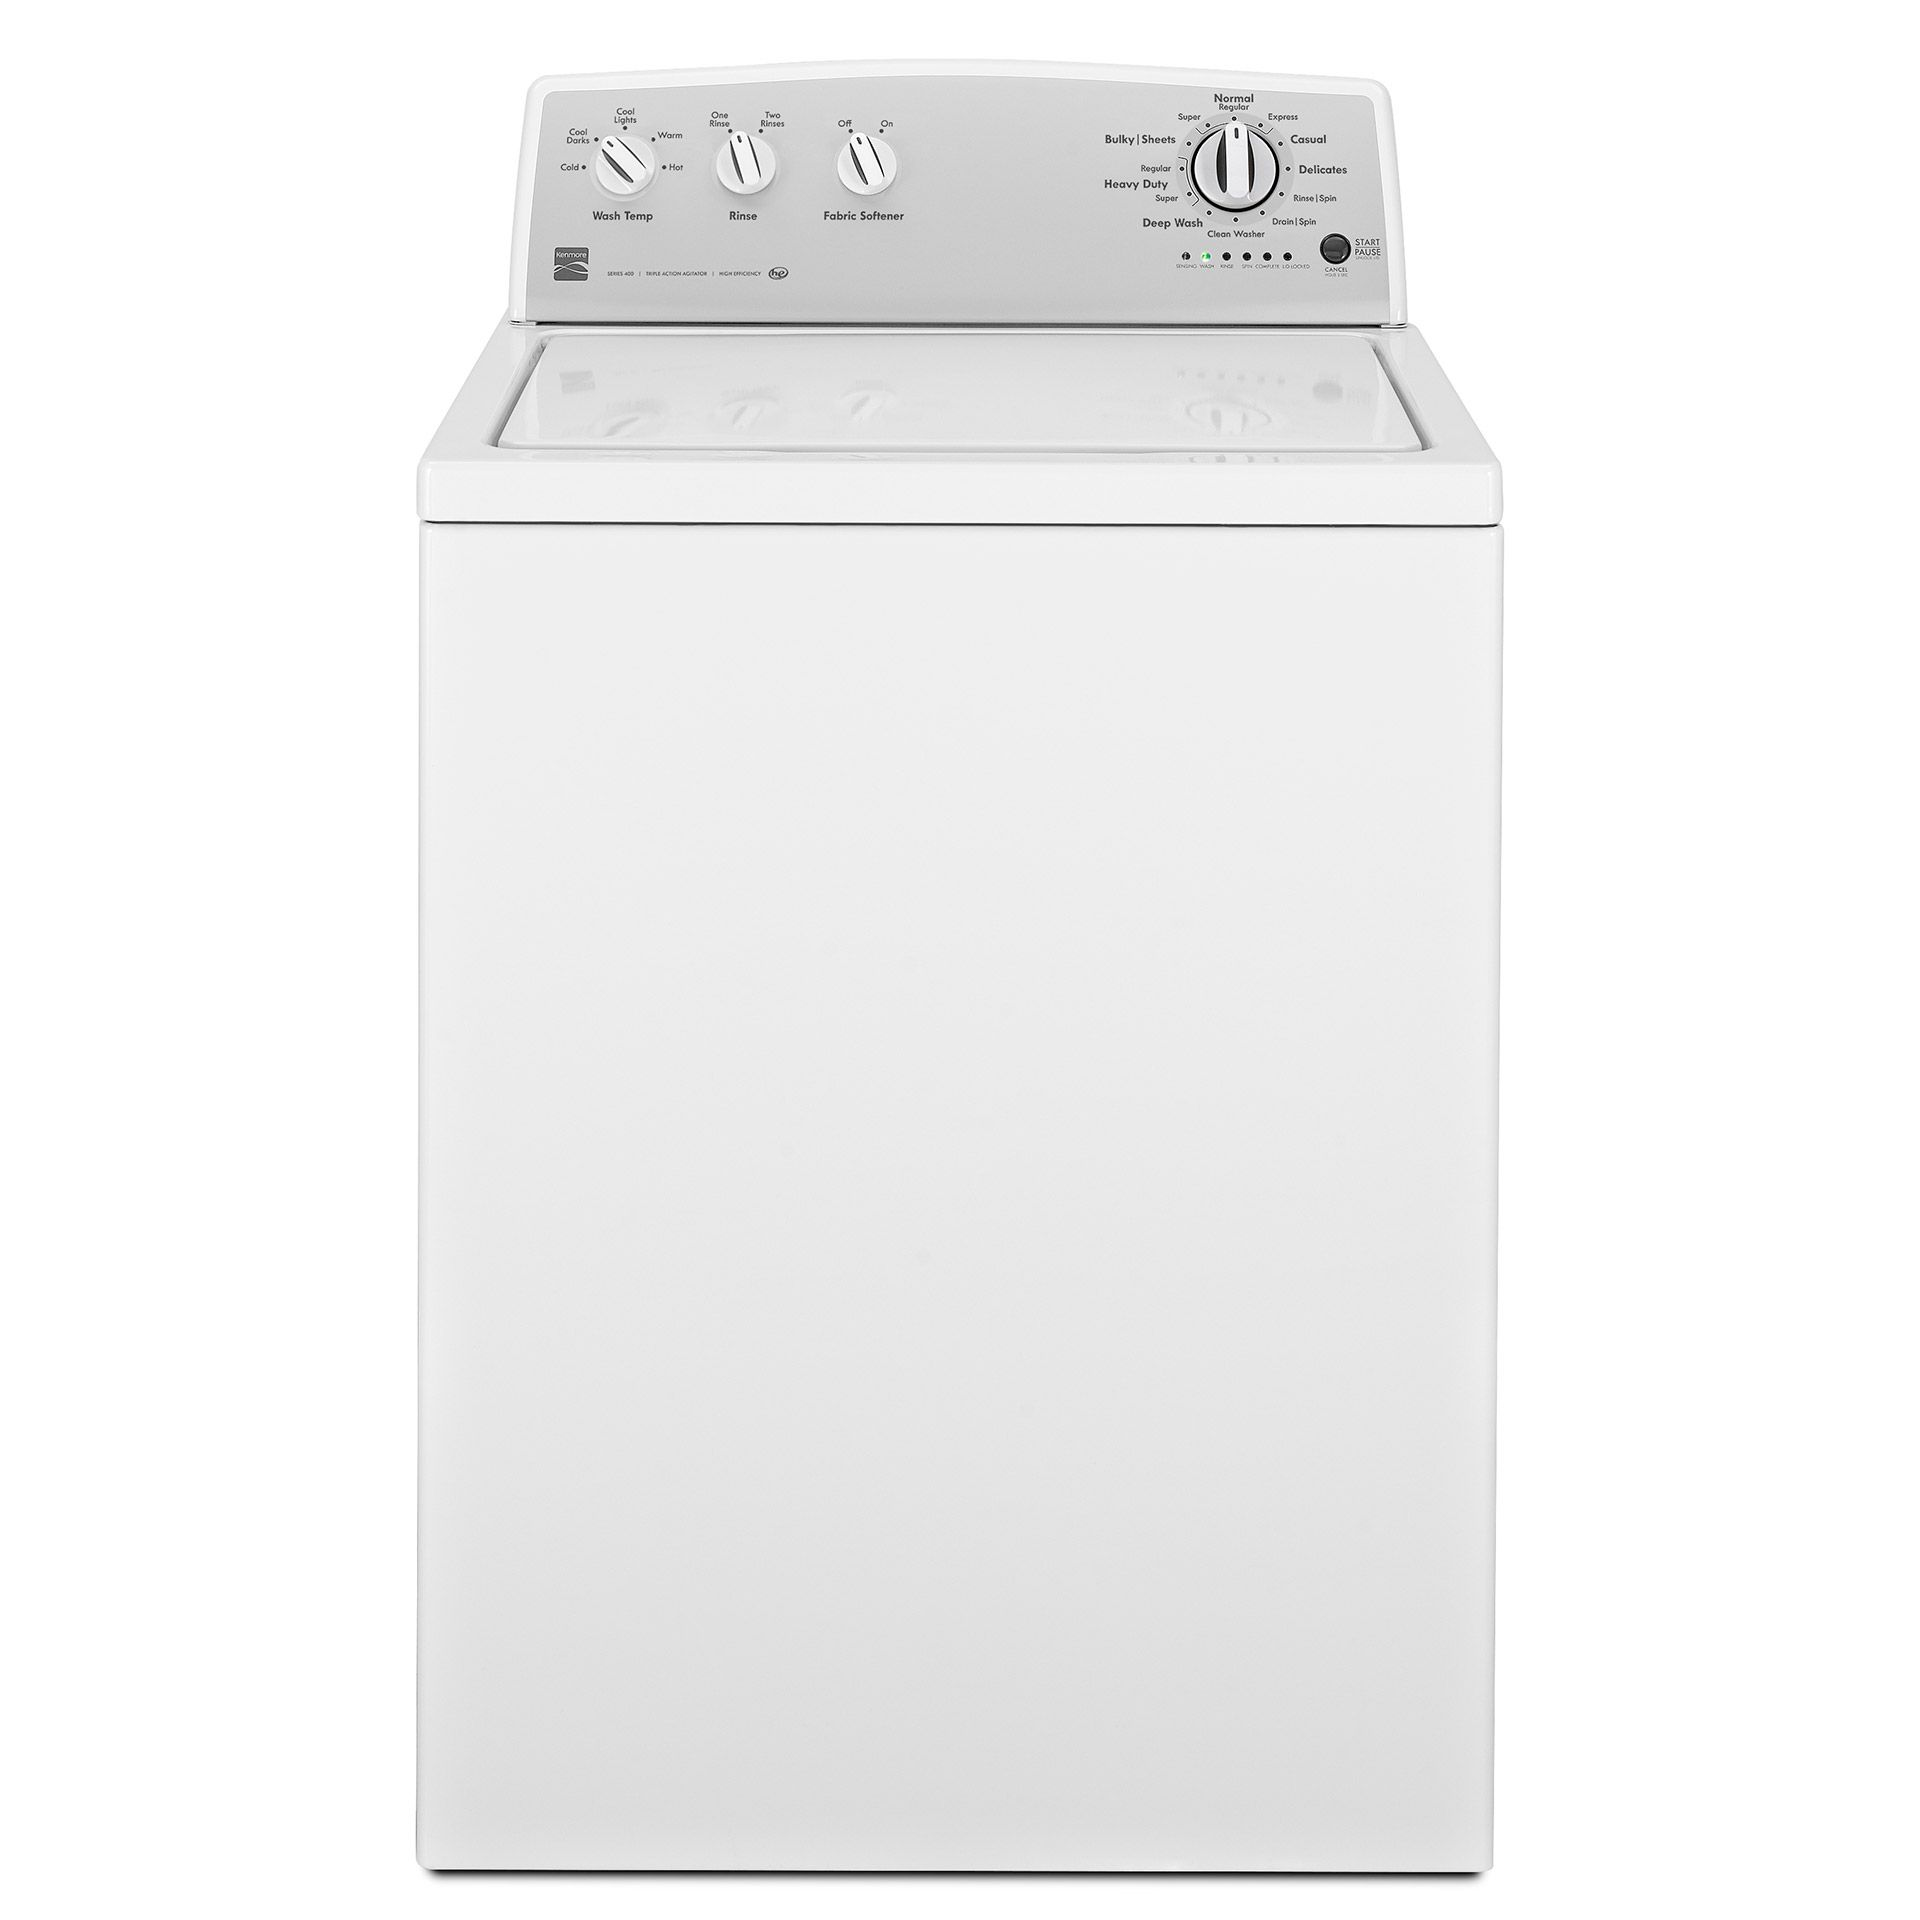 5500829c104dd ghk washing machine kenmore s2